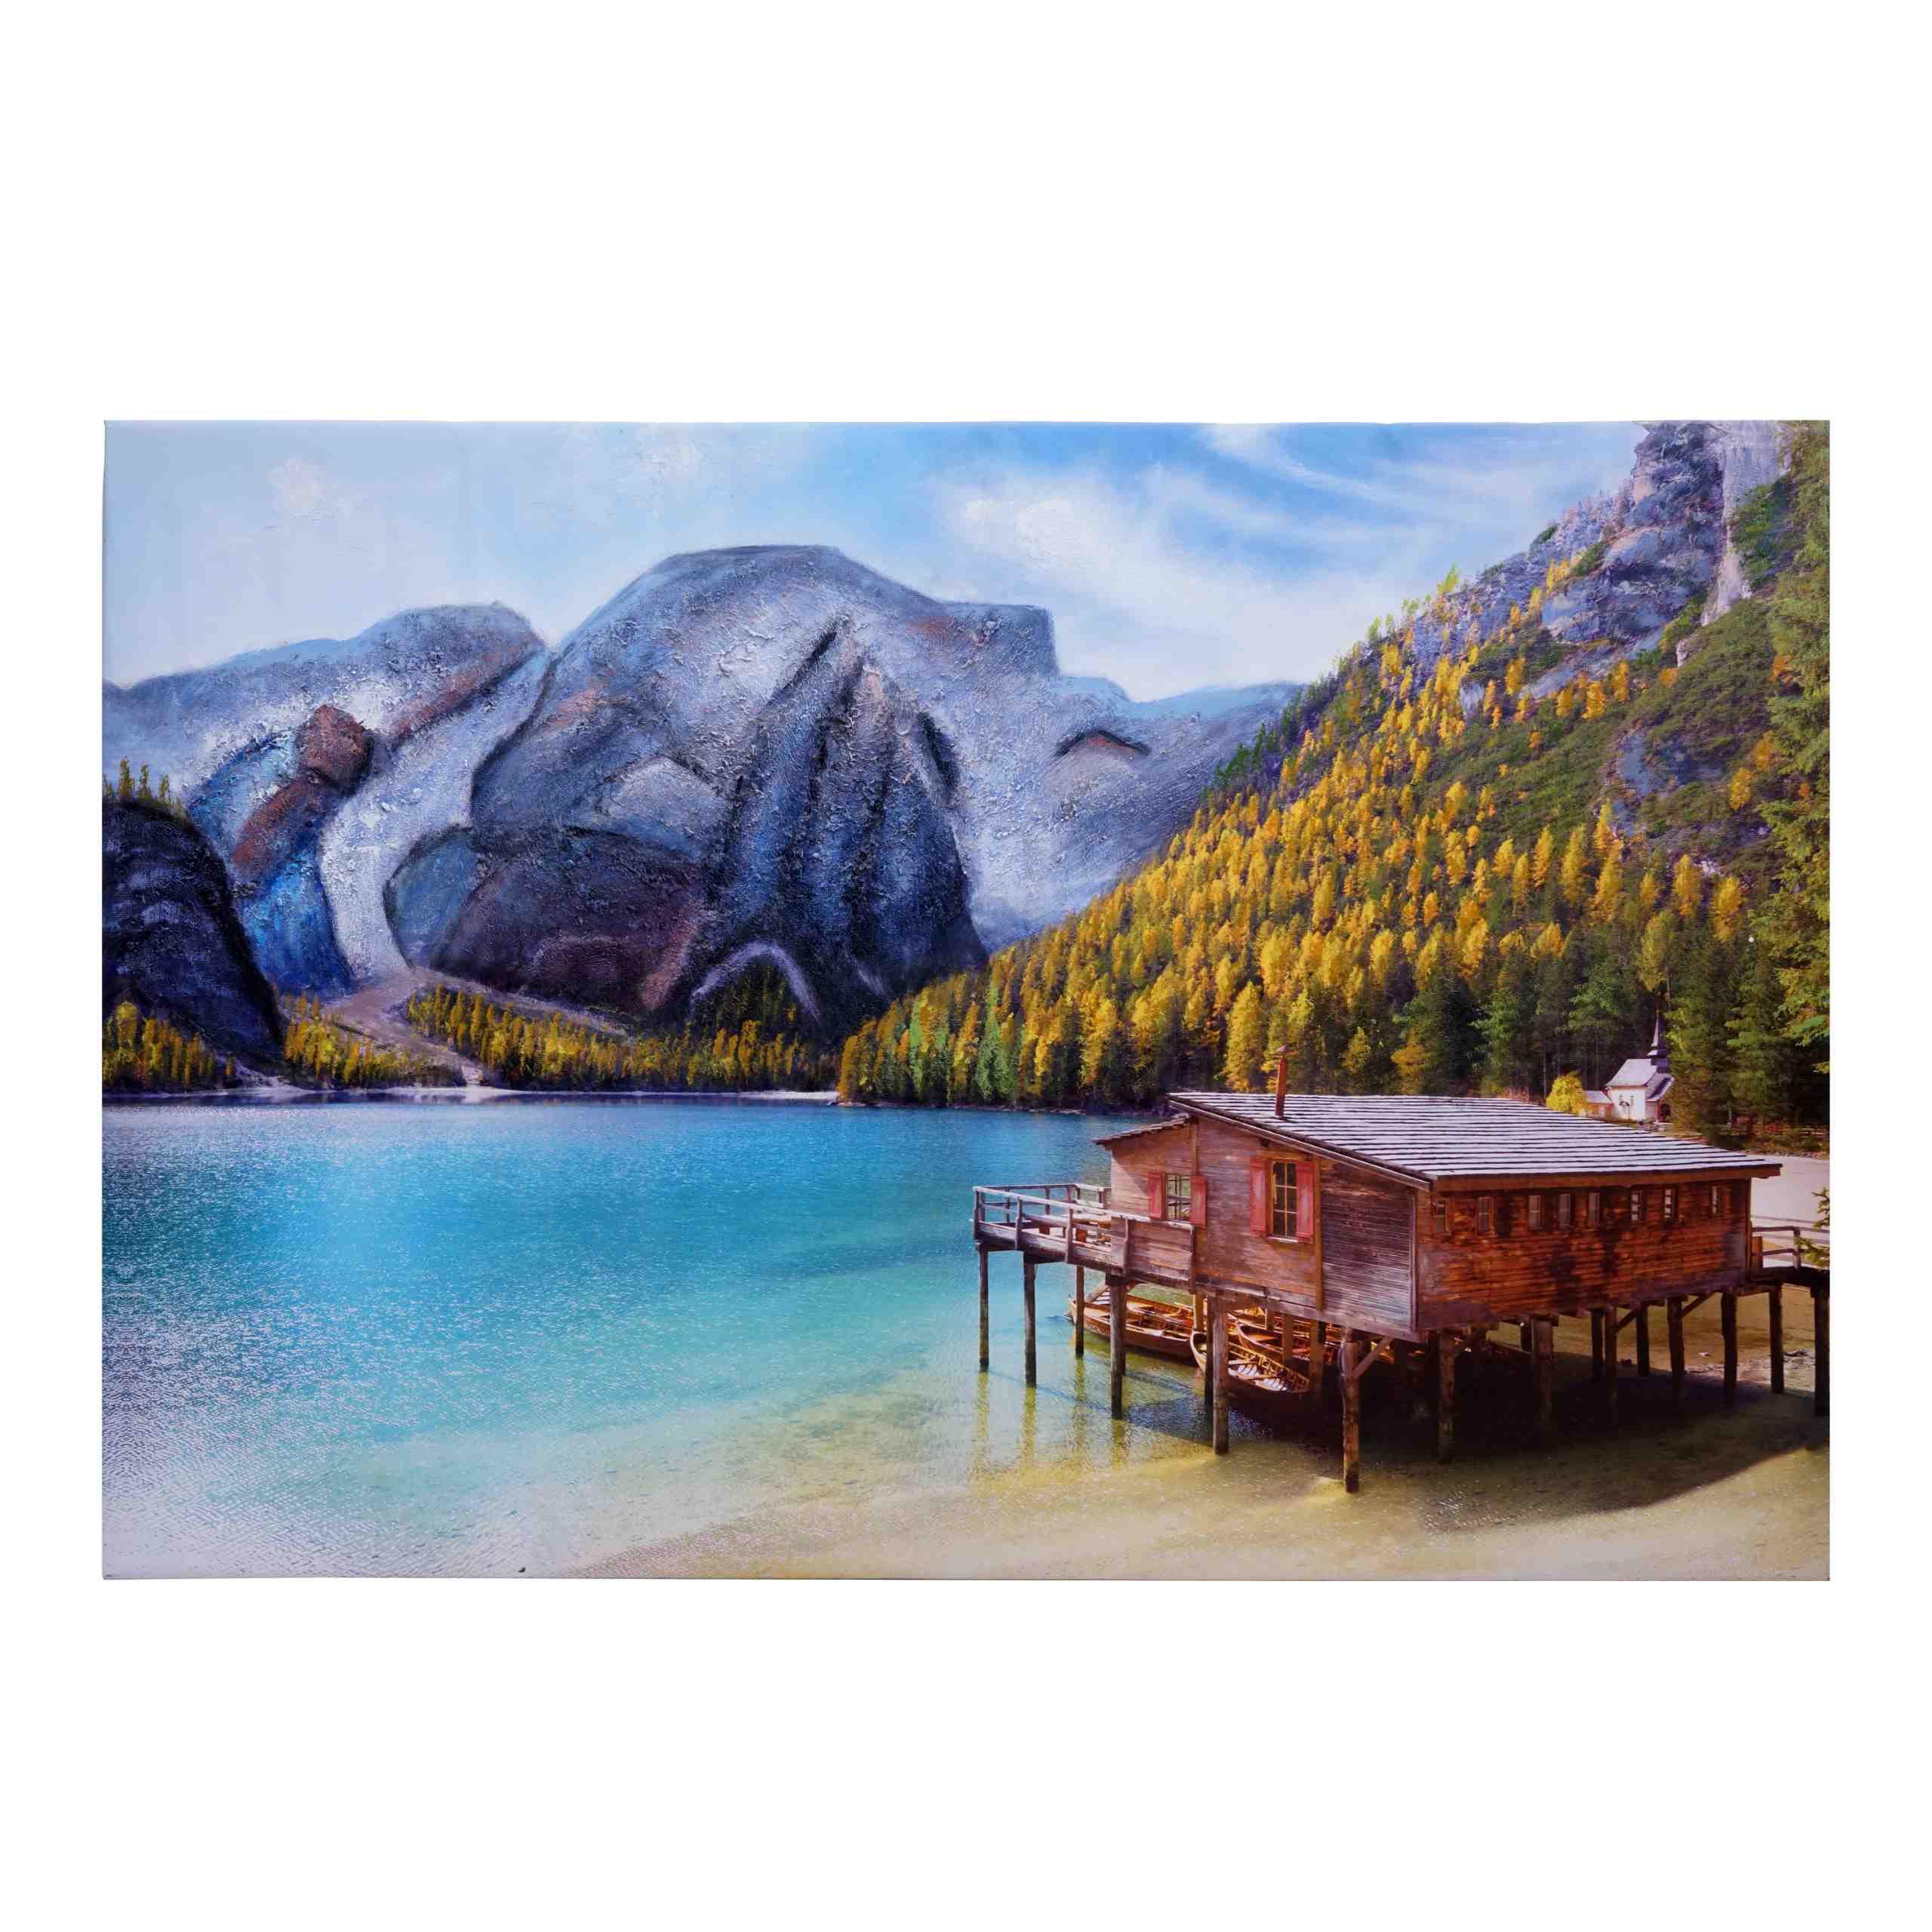 Mendler Wandgemälde Landschaft HWC-H25, Leinwandbild Sandgemälde Gemälde, handgemaltes XL Wandbild ~ Variant 72770